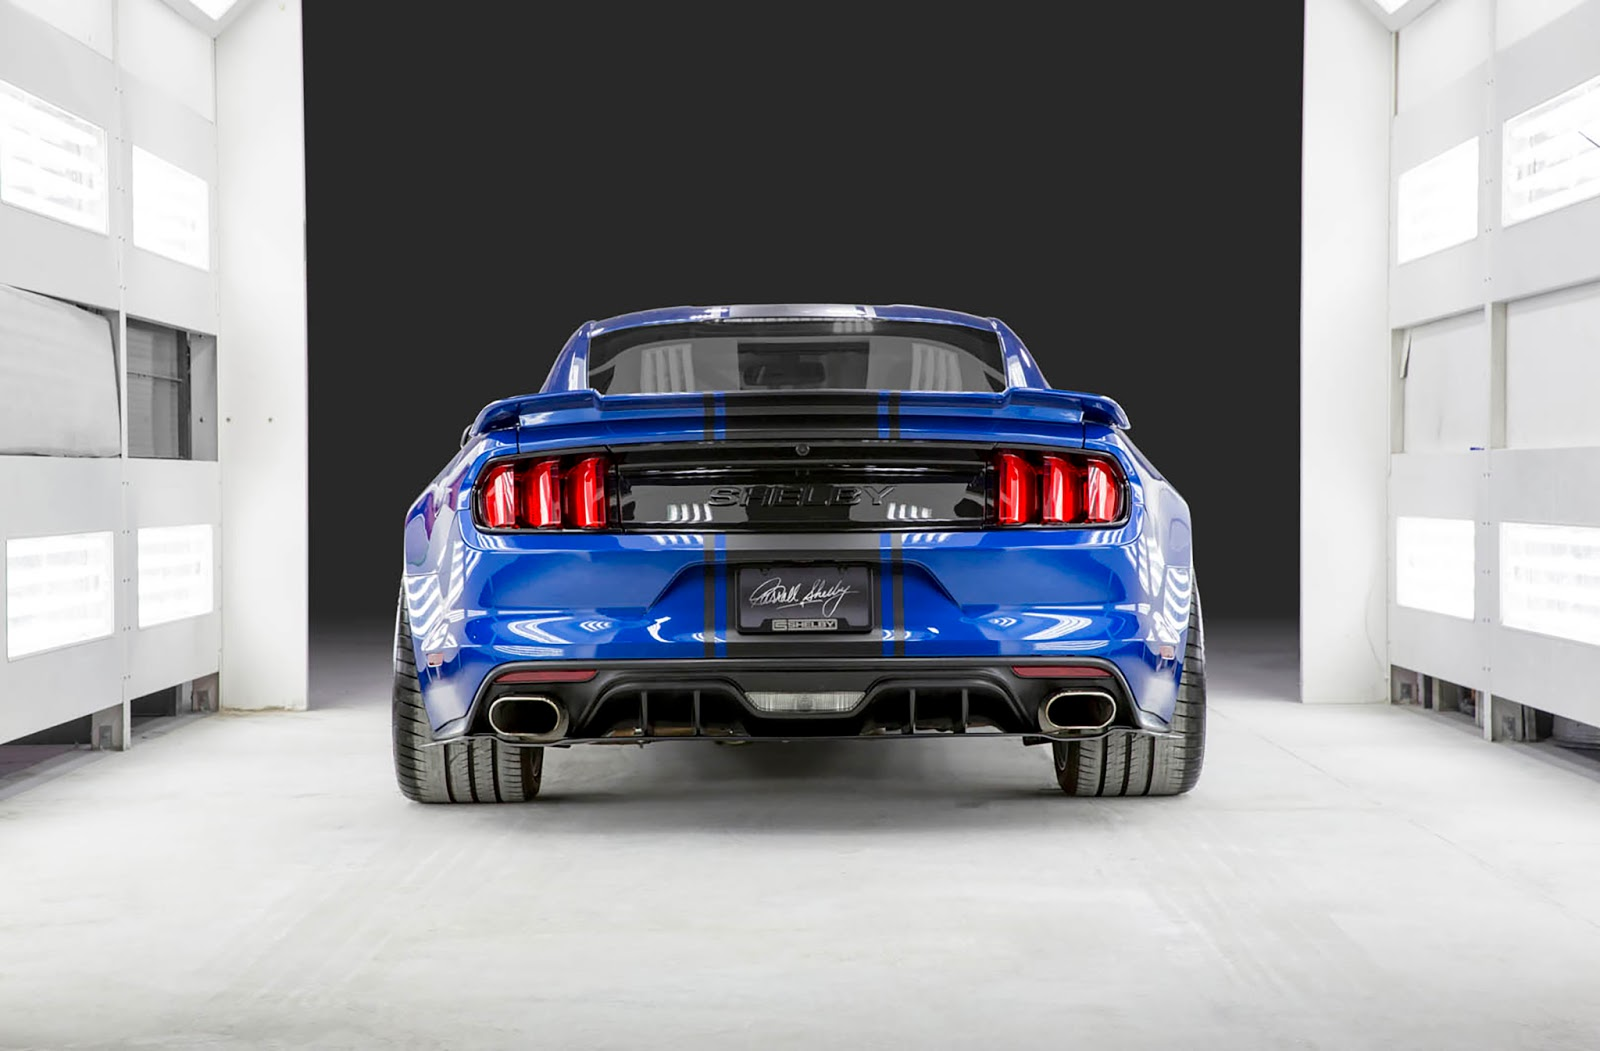 2017-Shelby-Super-Snake-2